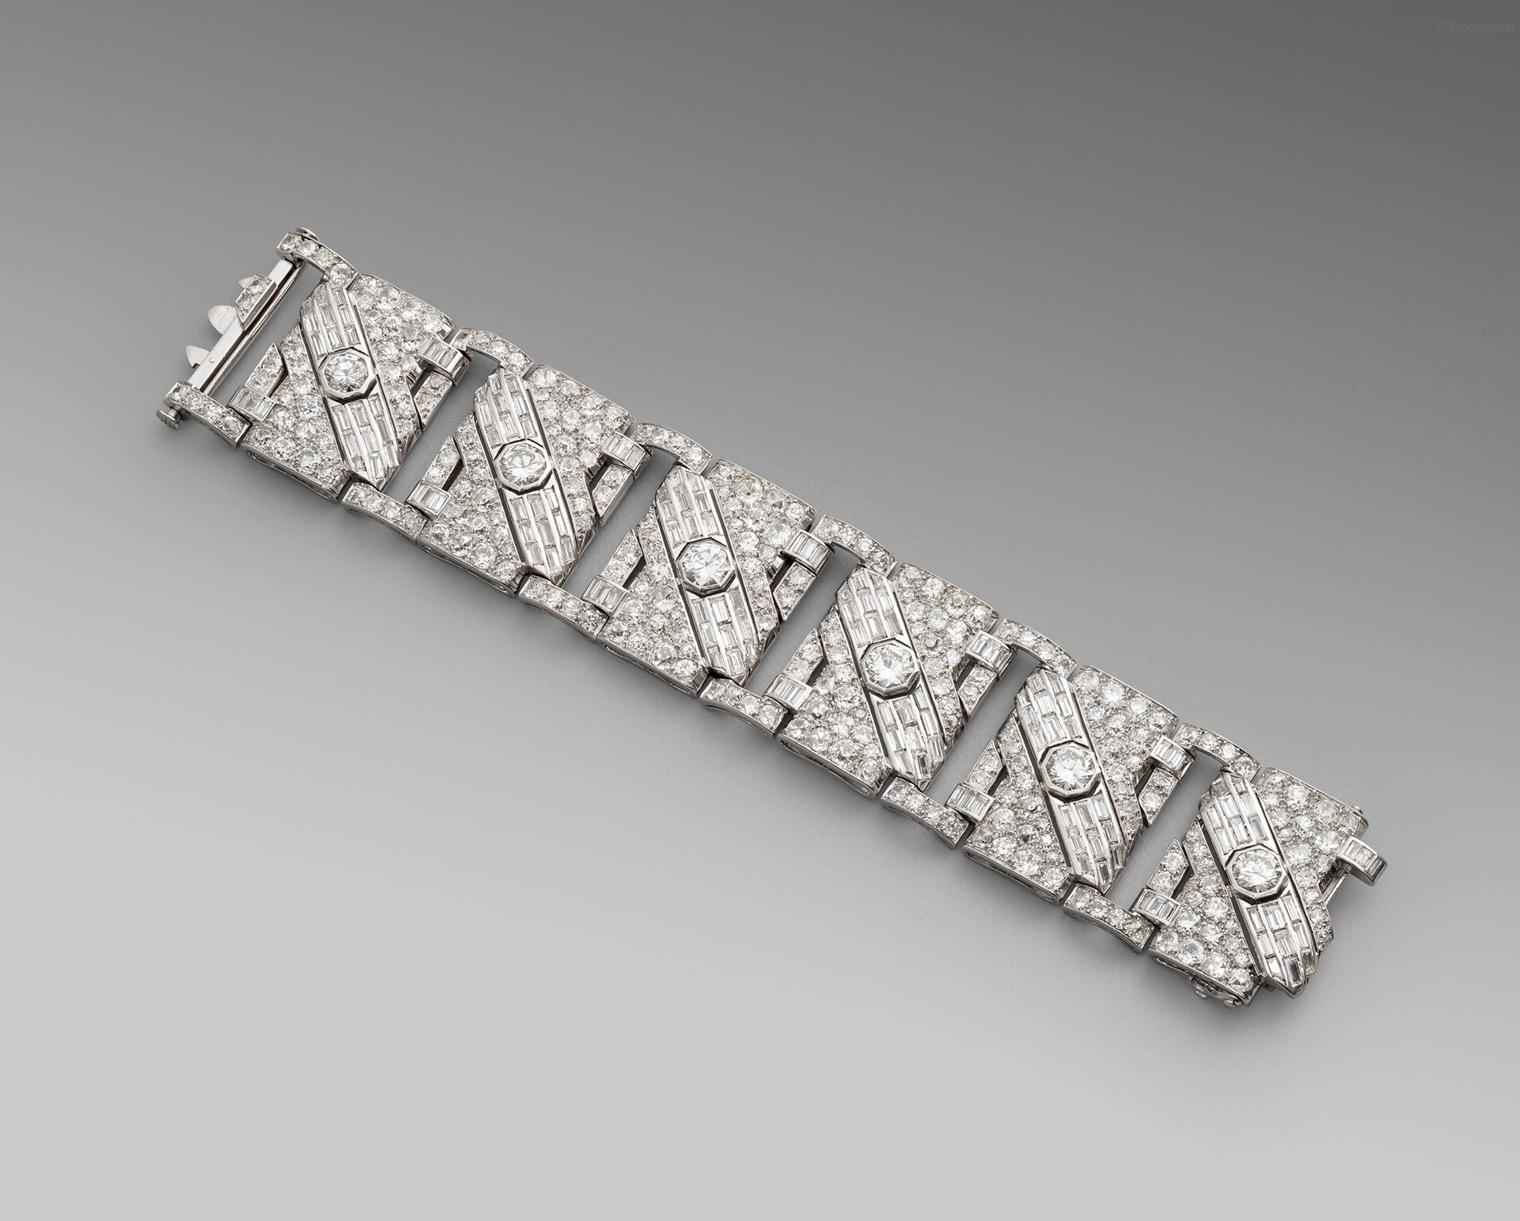 An Important Art Deco Diamond Bracelet